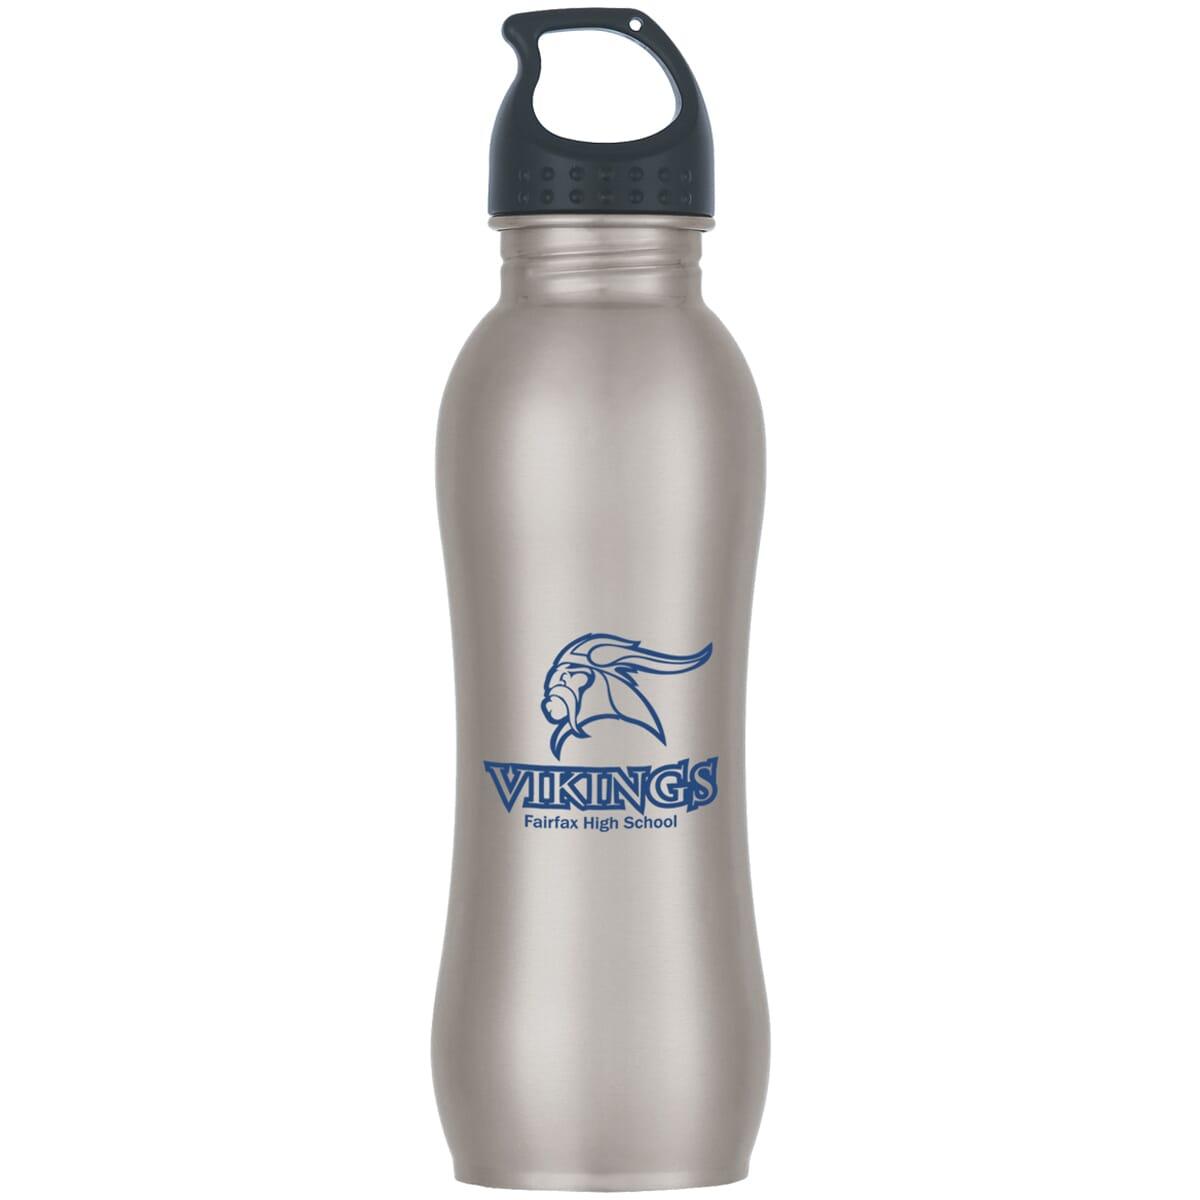 Stainless steel water bottle with school logo